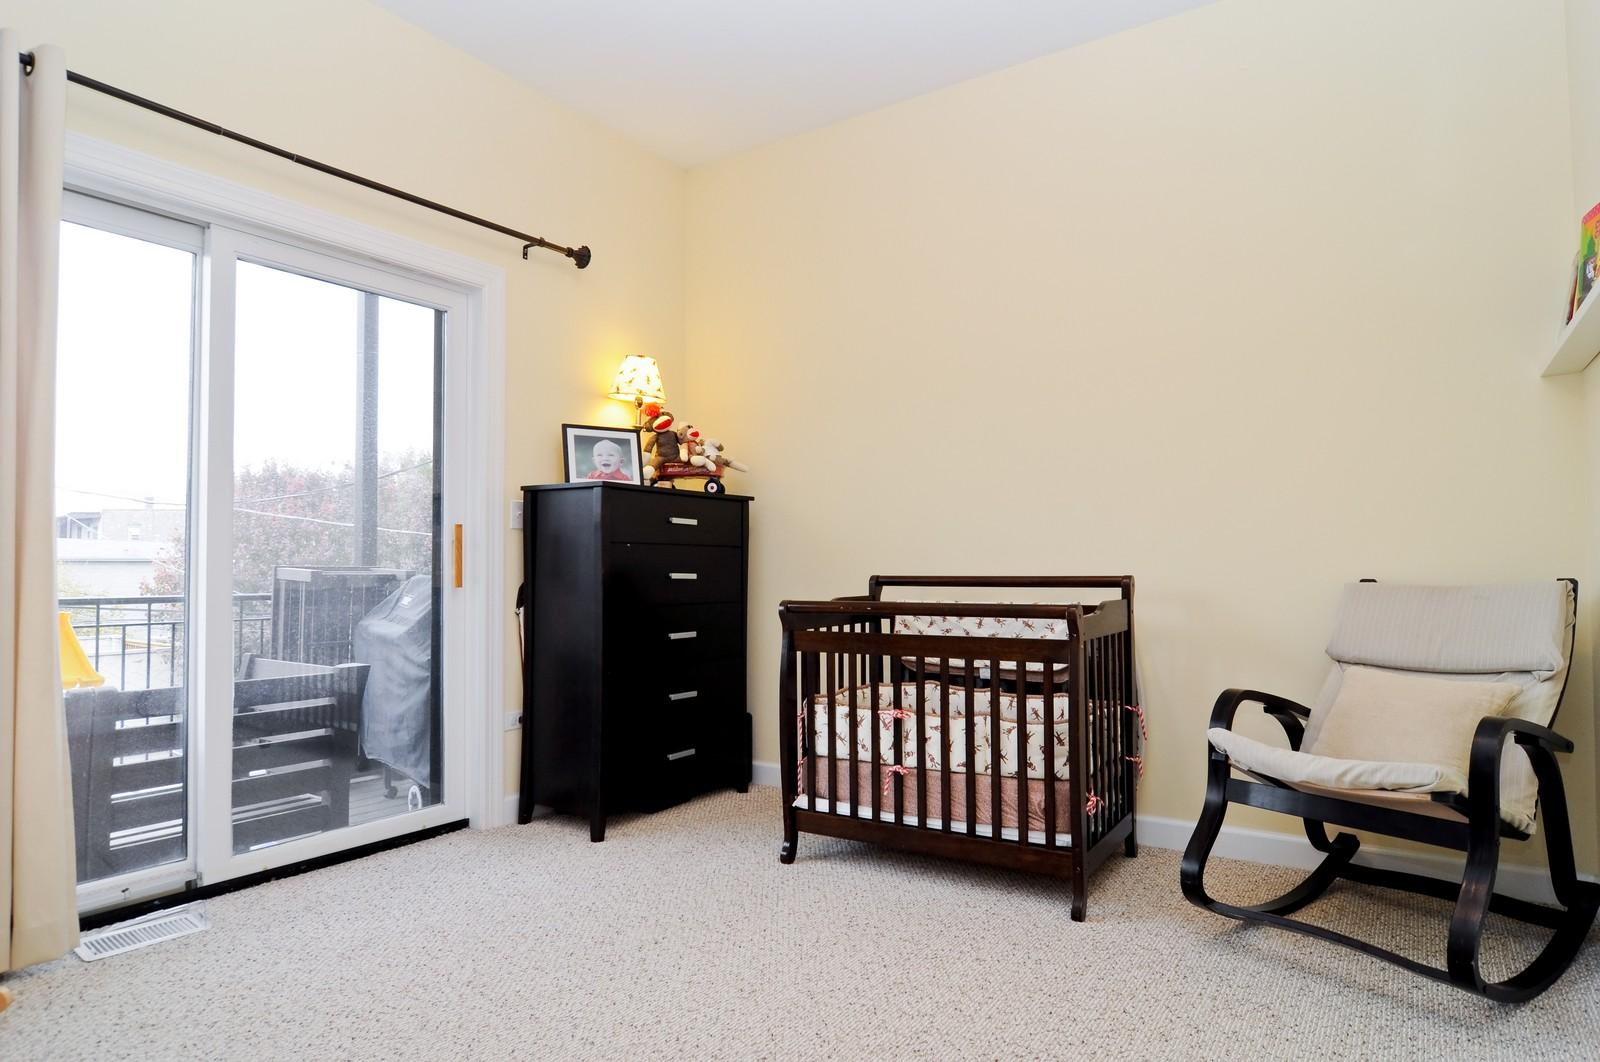 Real Estate Photography - 1846 W Armitage, Unit 2E, Chicago, IL, 60622 - Bedroom